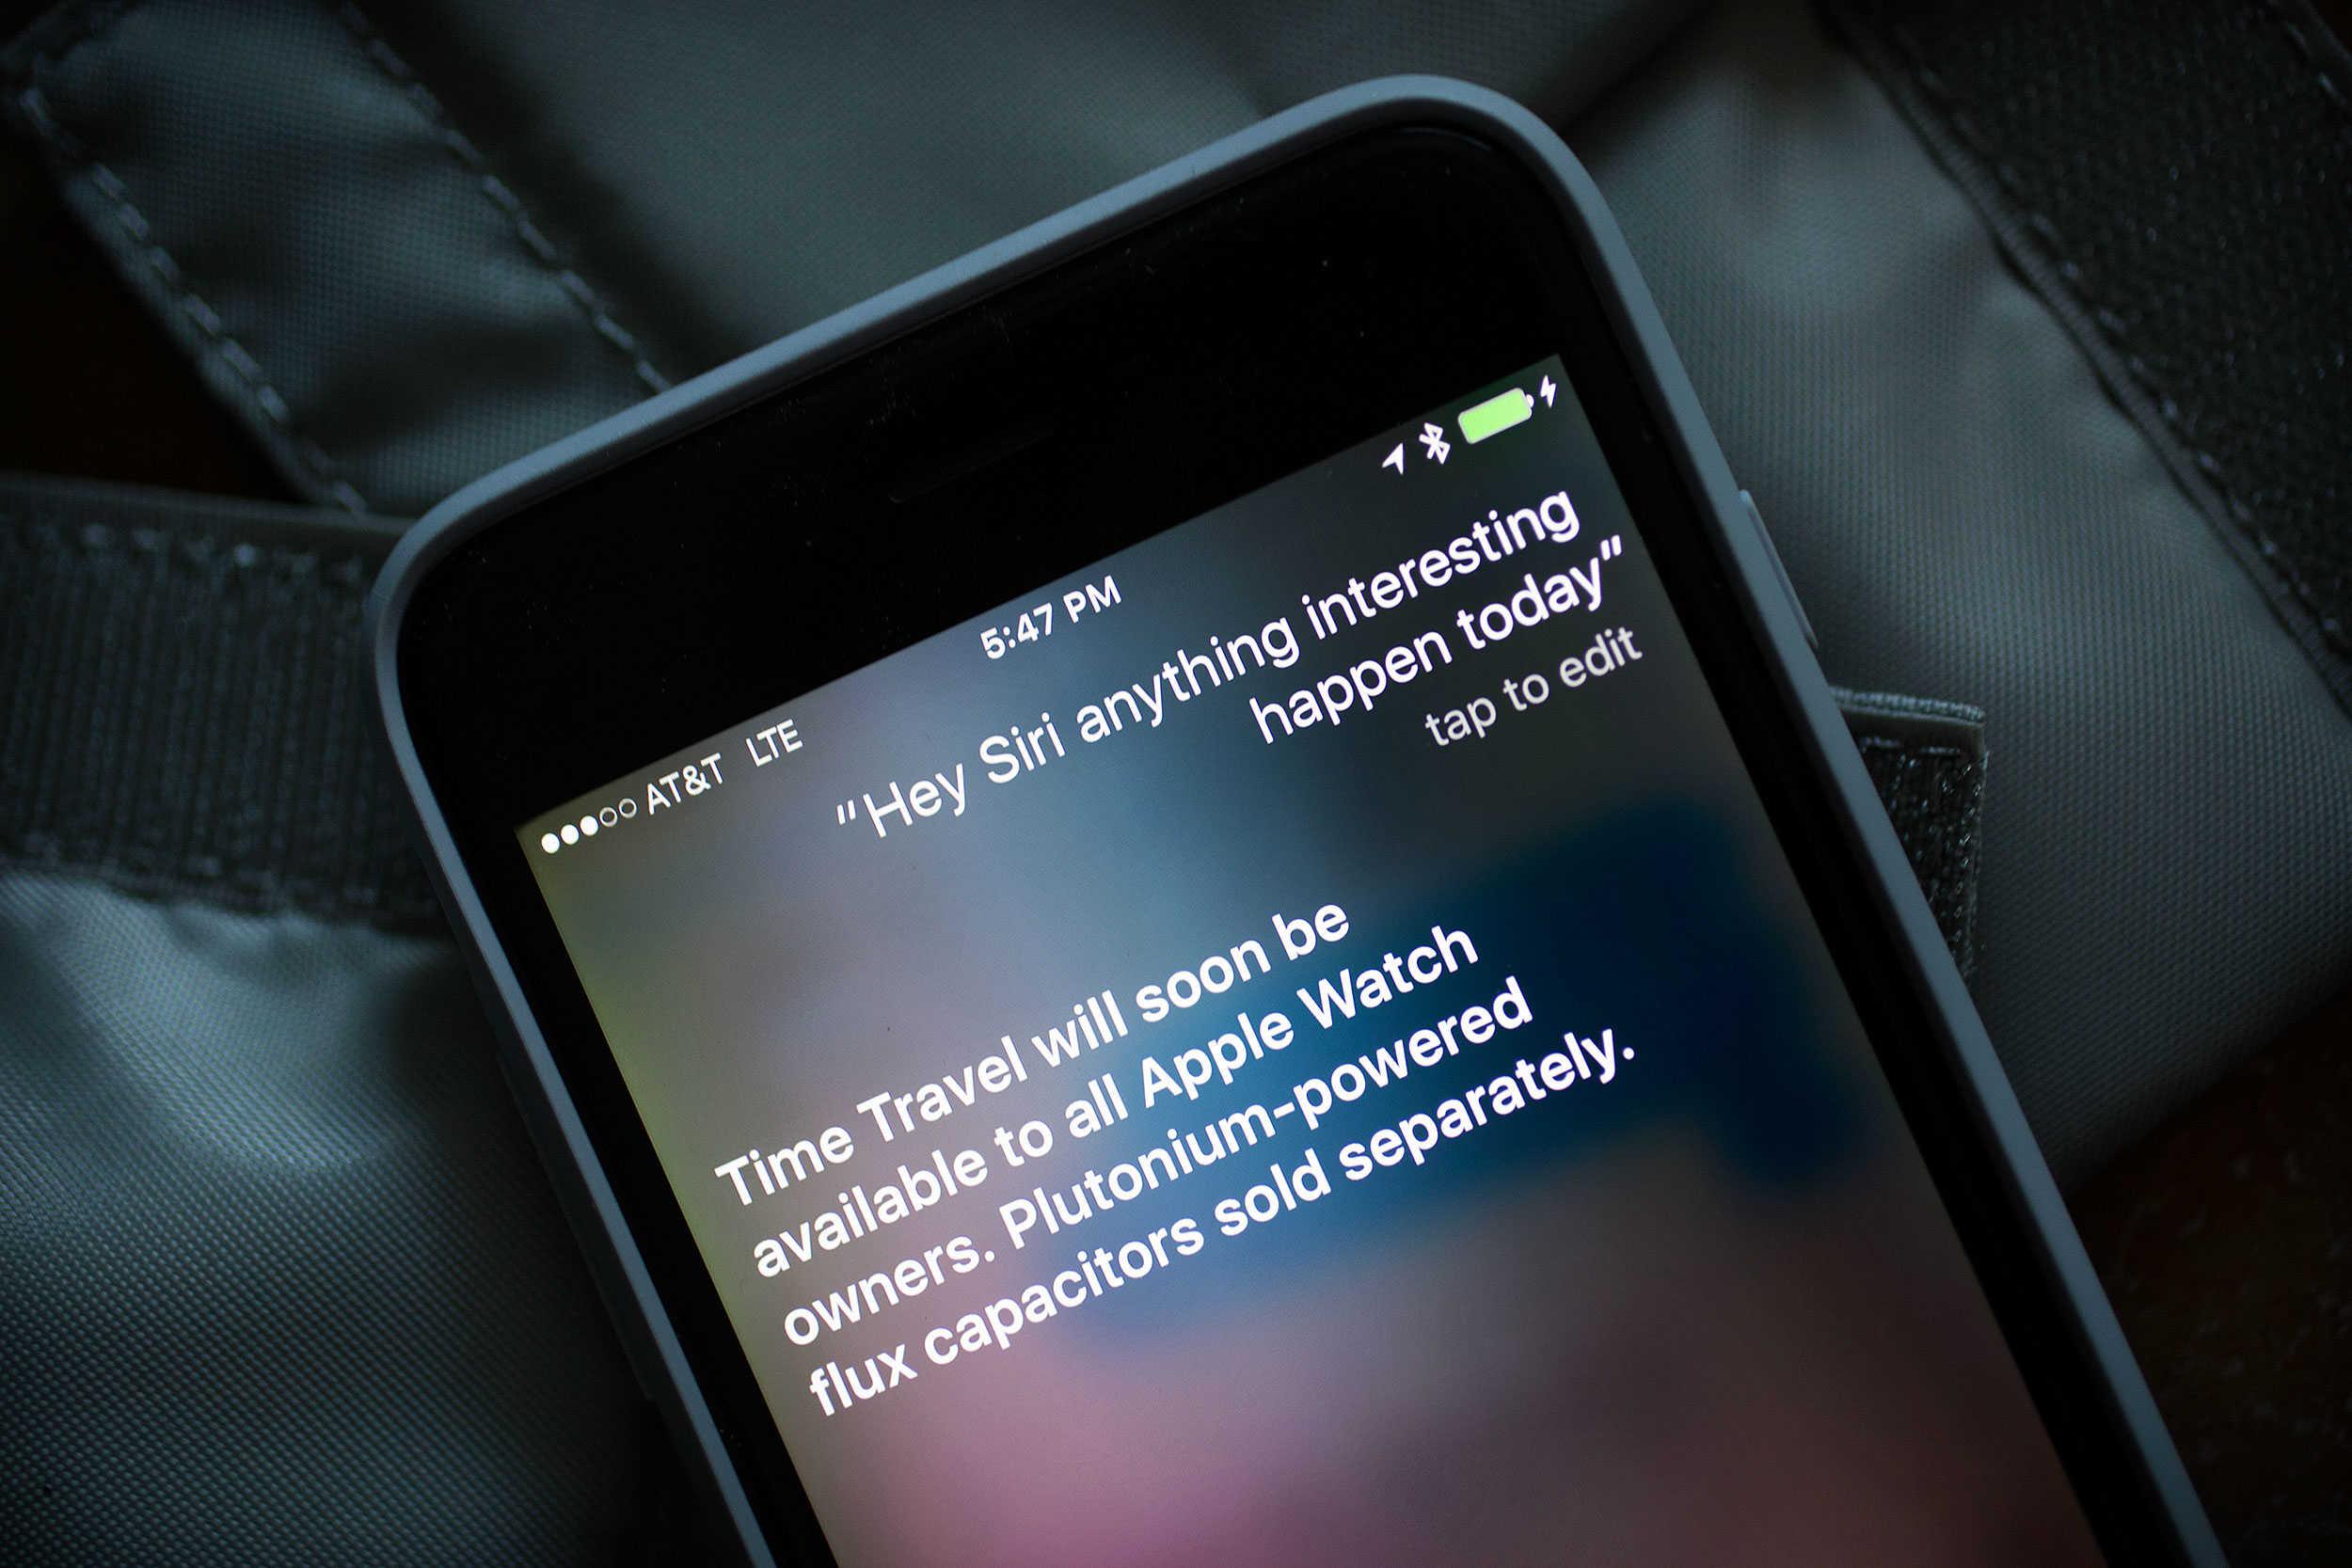 Siri Anything Interesting